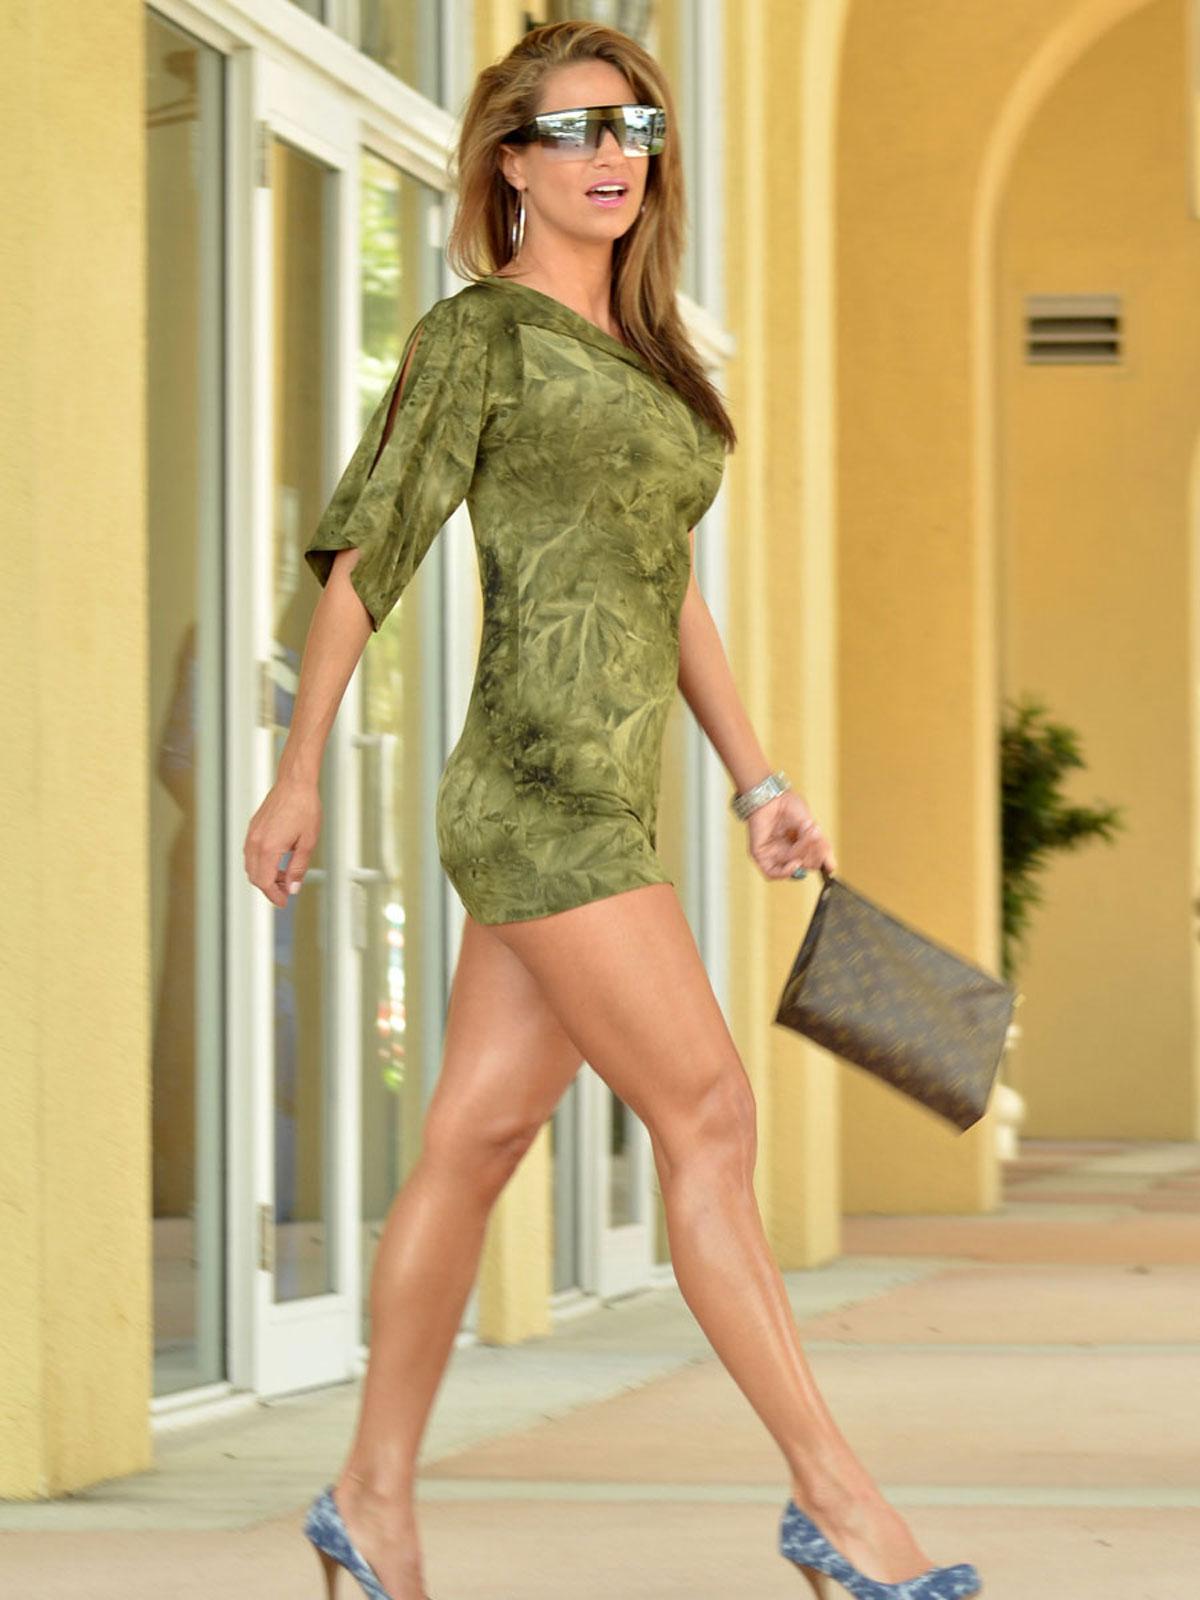 Jennifer Nichole Lee shows of her long legs in Leggy Candids